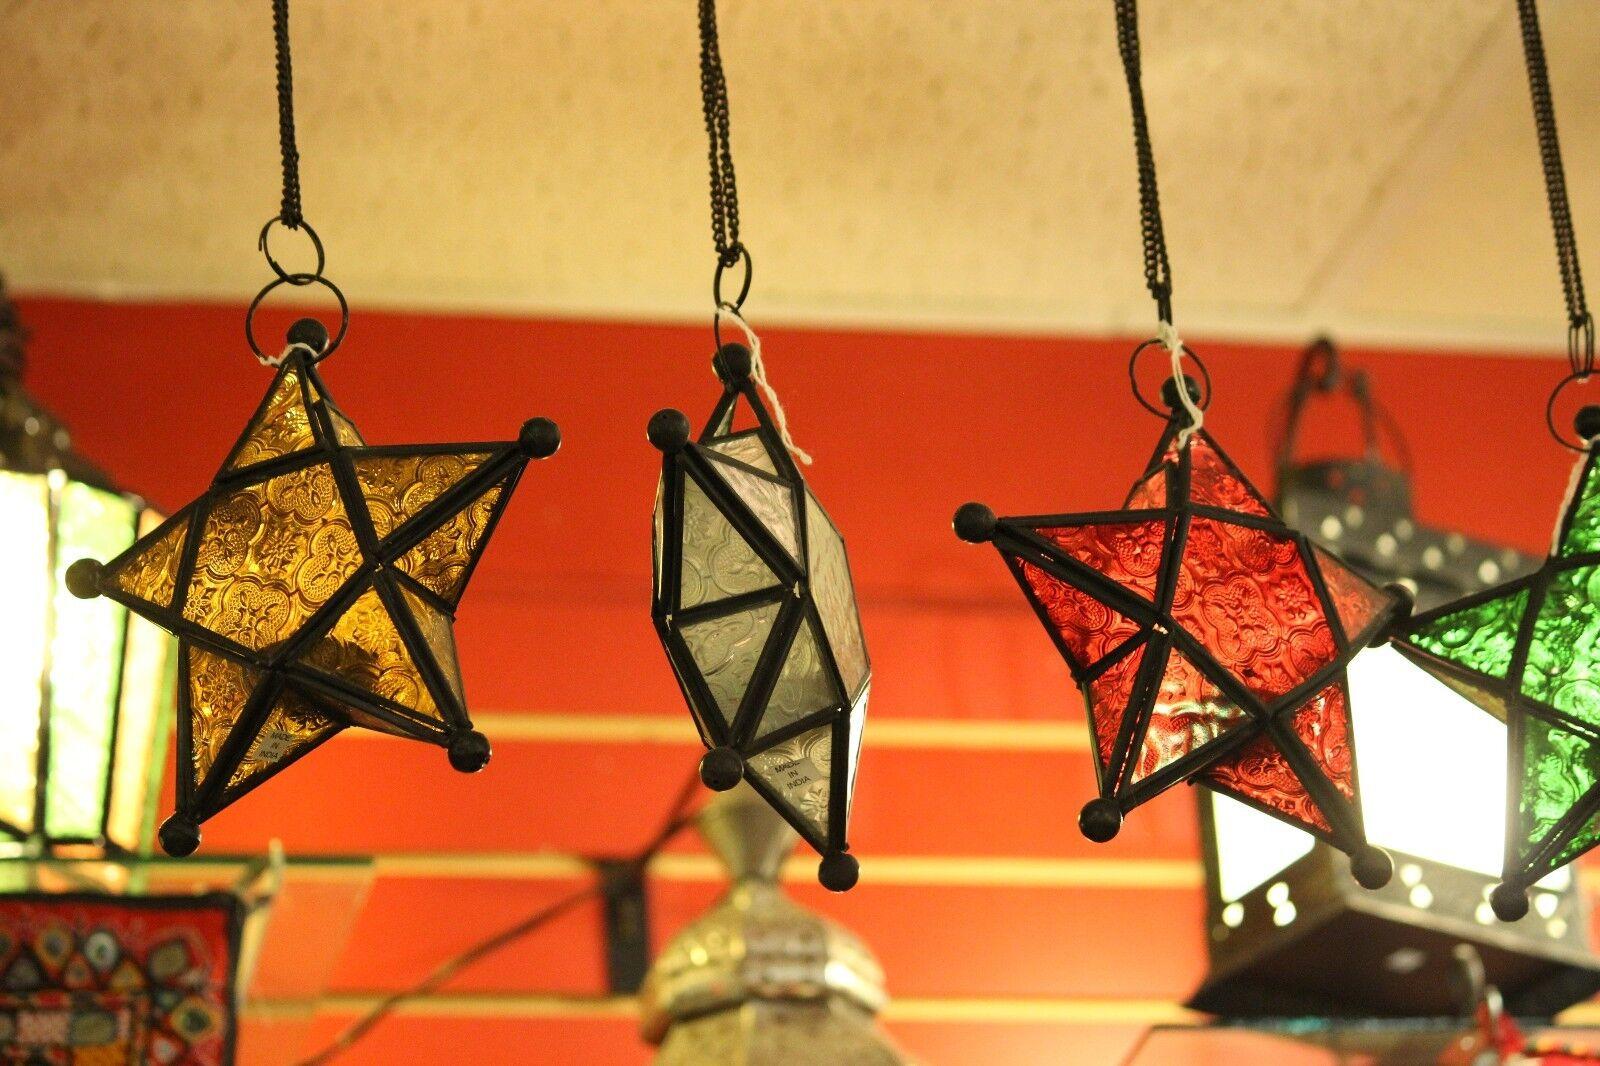 Moroccan Star Candleholder Indoor Patio Porch Decor Gift Lan